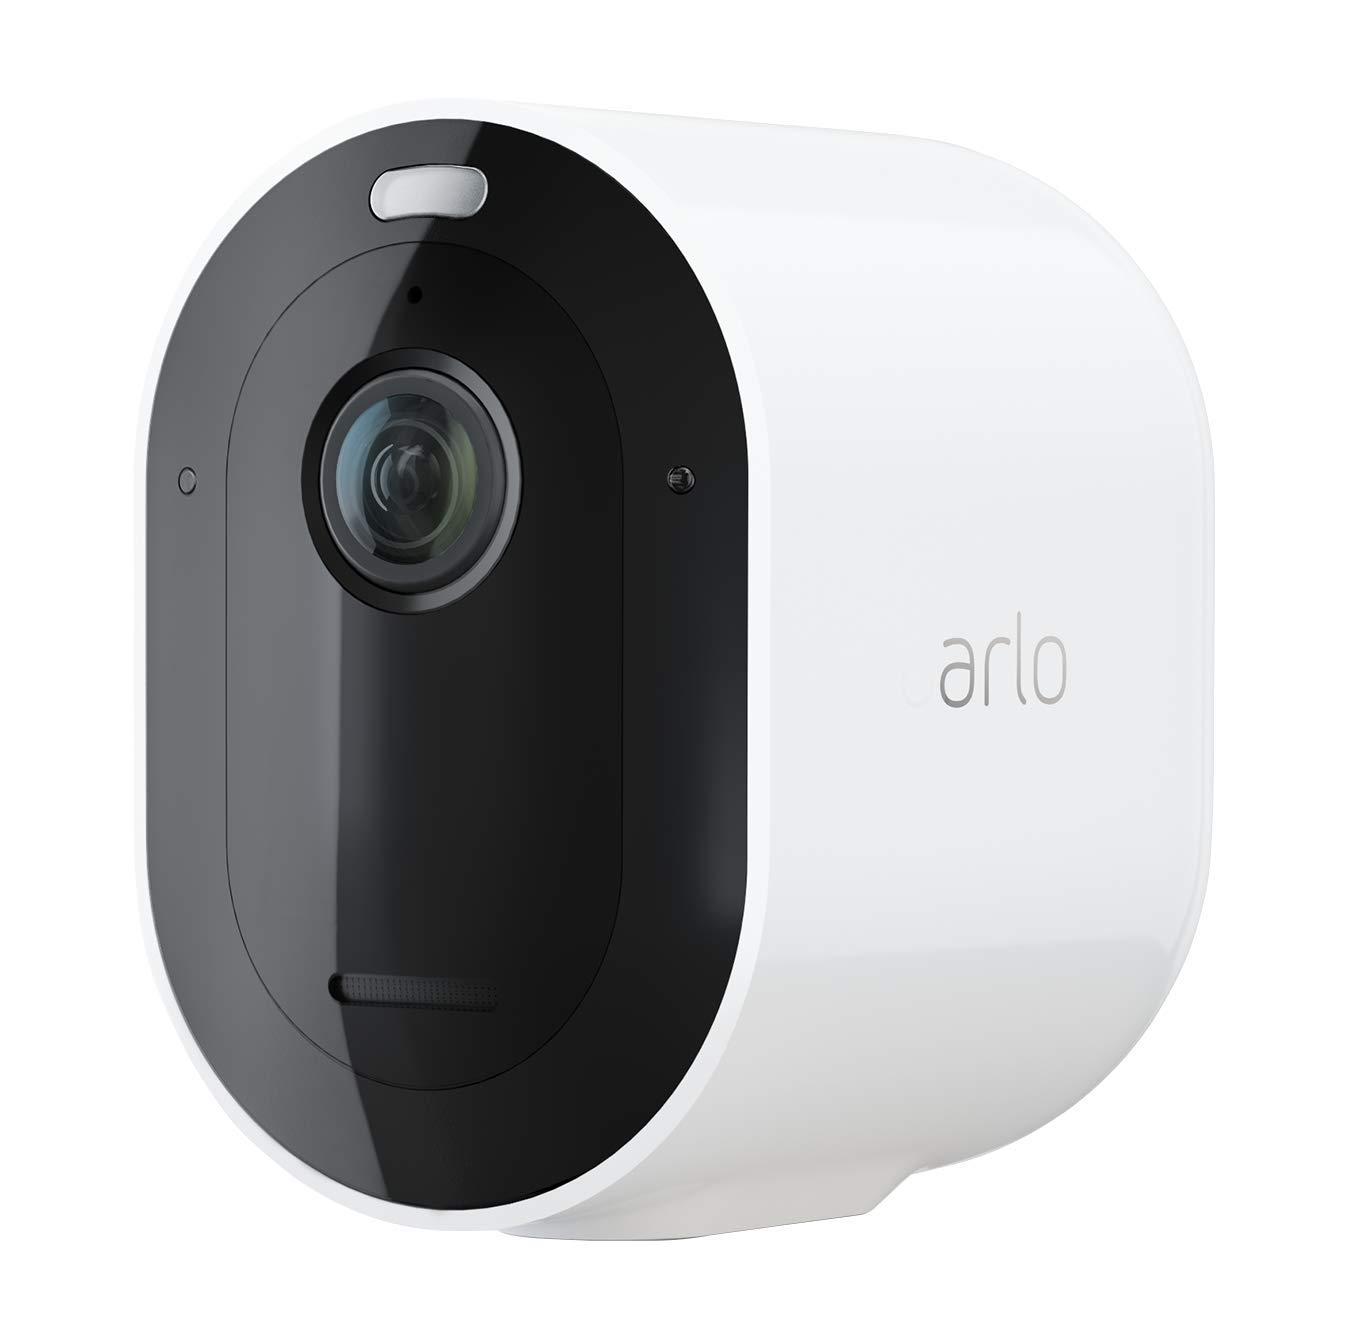 Arlo Pro 3 Smart Home Security Cameras Review